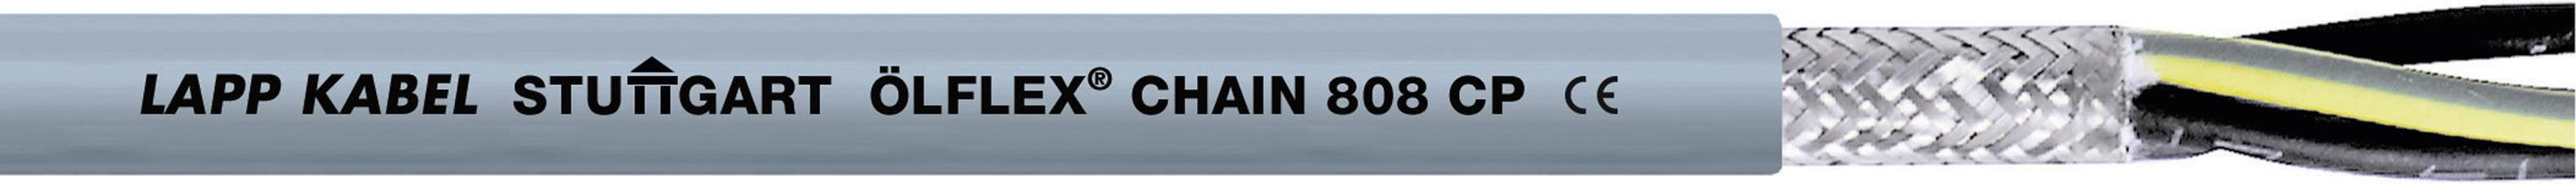 Žíla kabelu LappKabel ÖLFLEX CHAIN 808 CP 4G1,5 (1027777), 4x 1,5 mm², polyurethan, Ø 8,4 mm, stíněný, 50 m, š